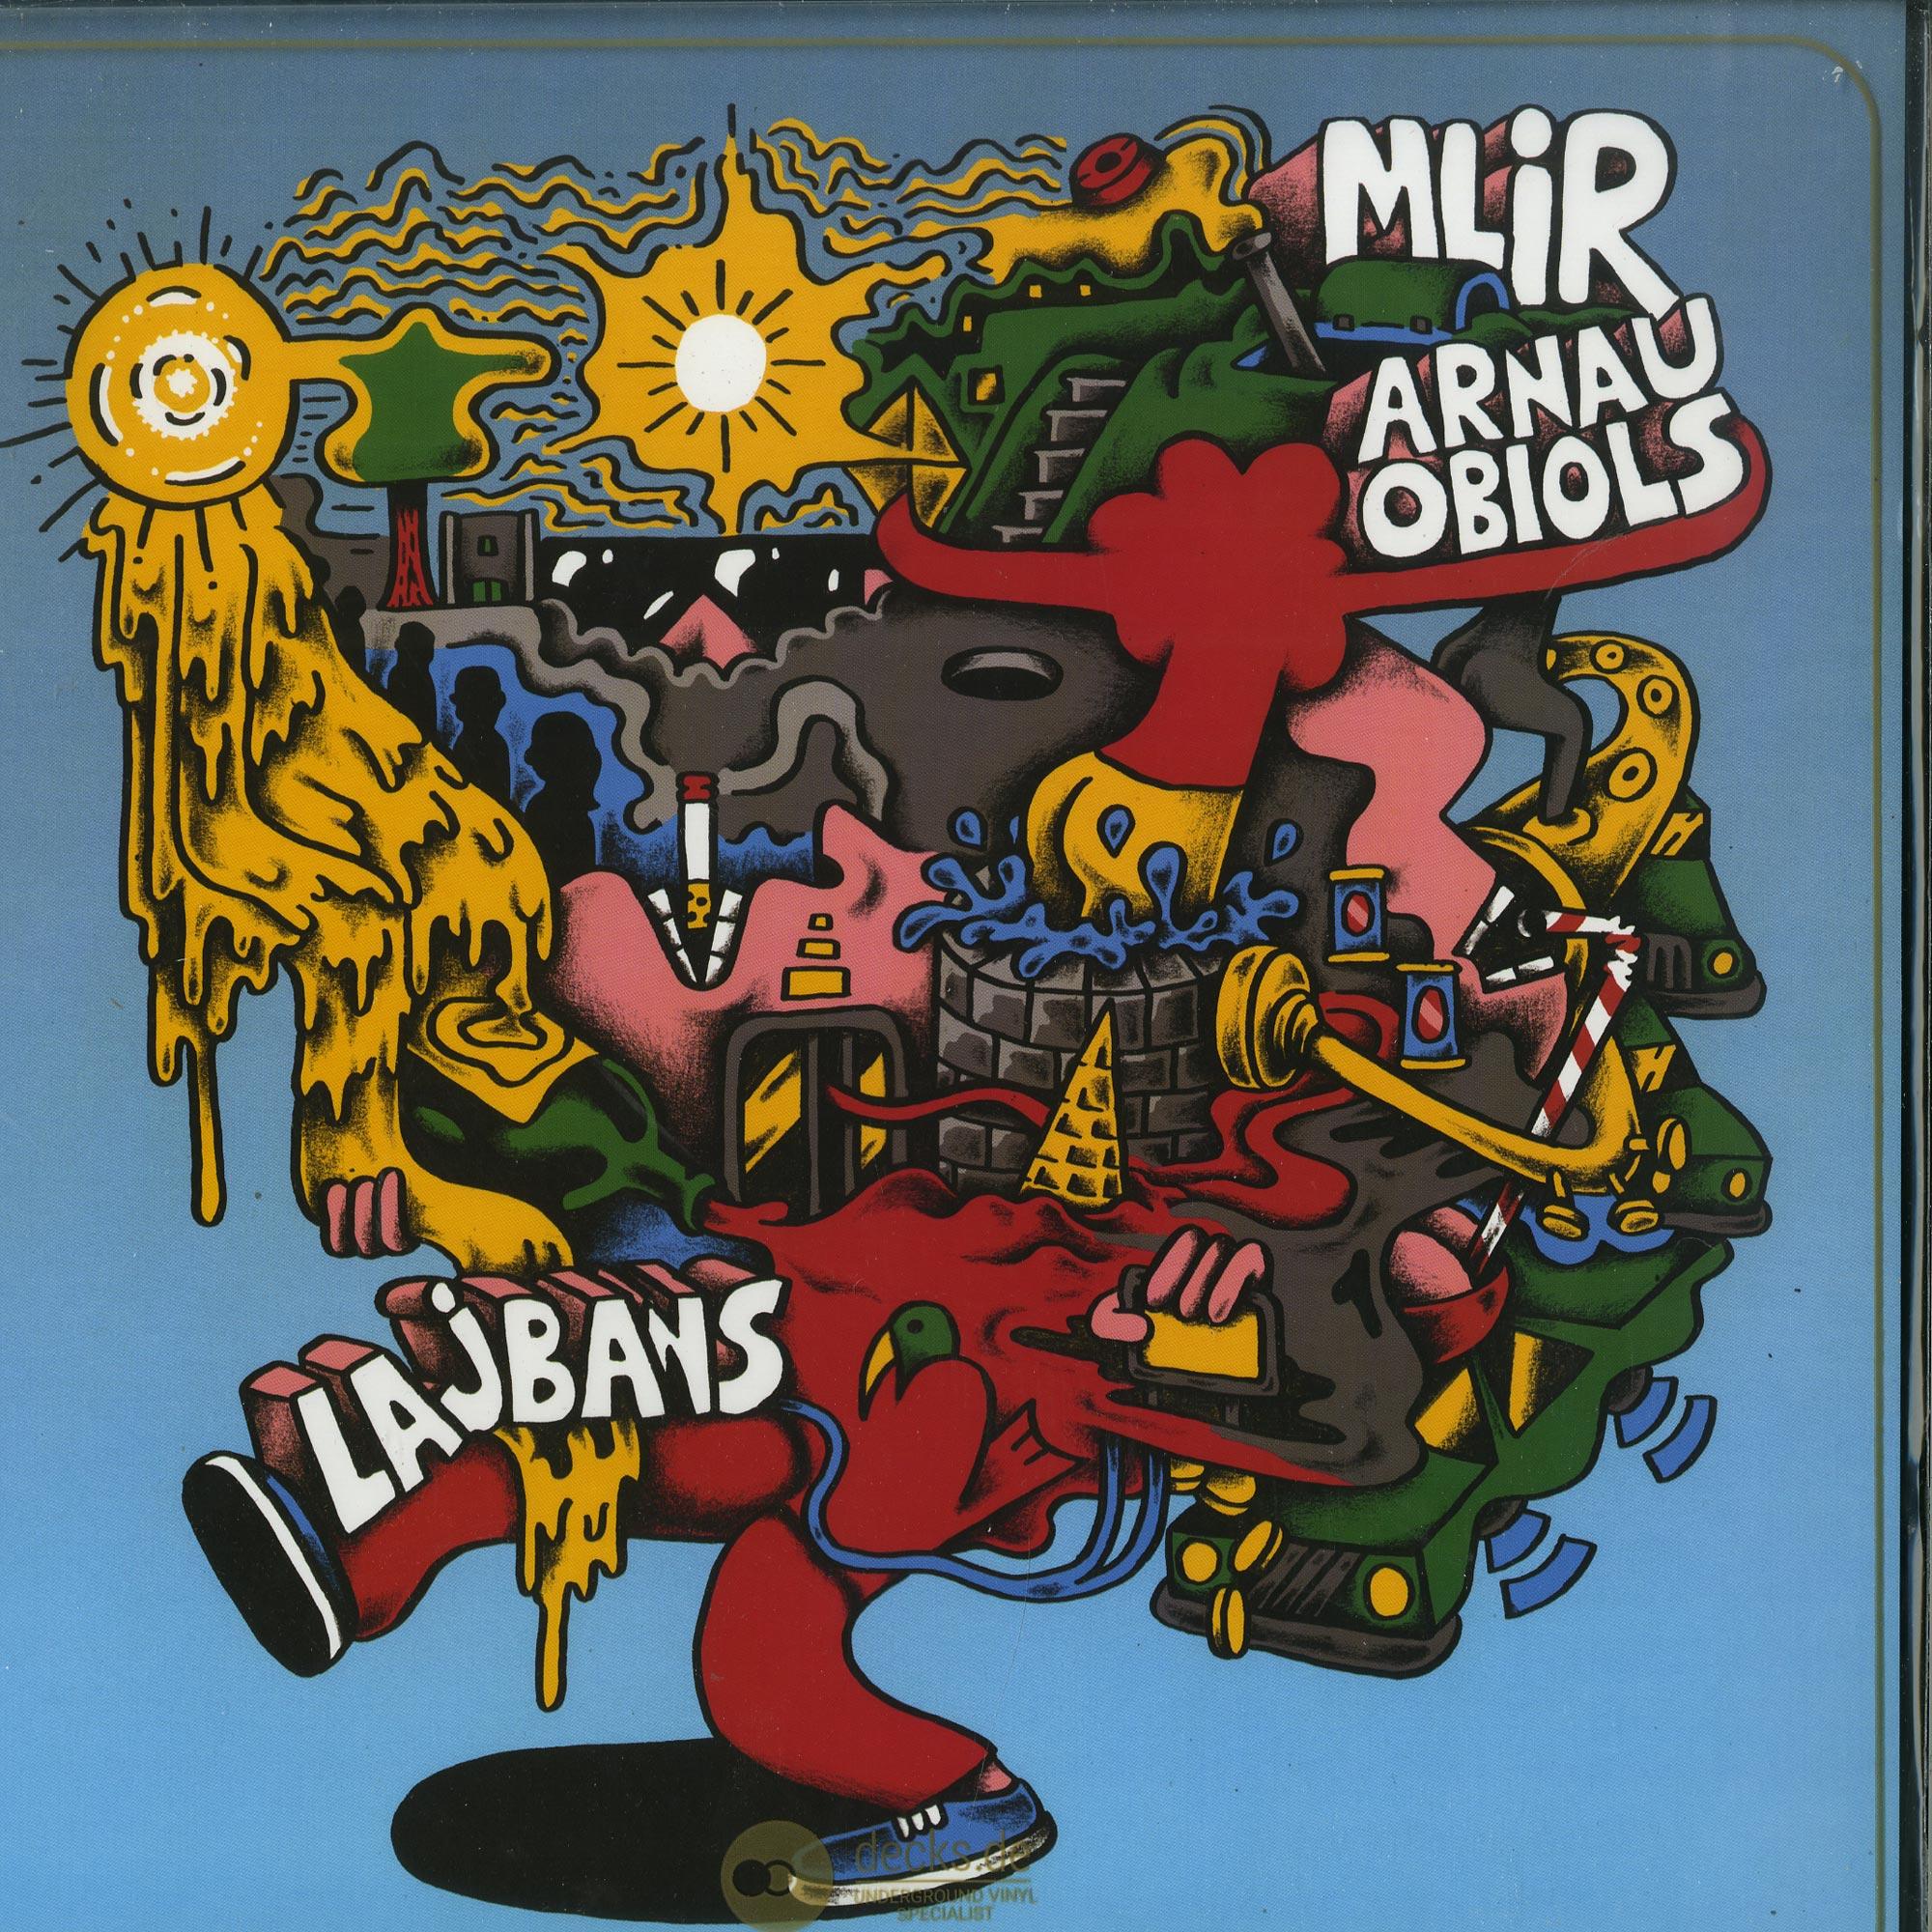 MLiR & Arnau Obiols - LAJBANS